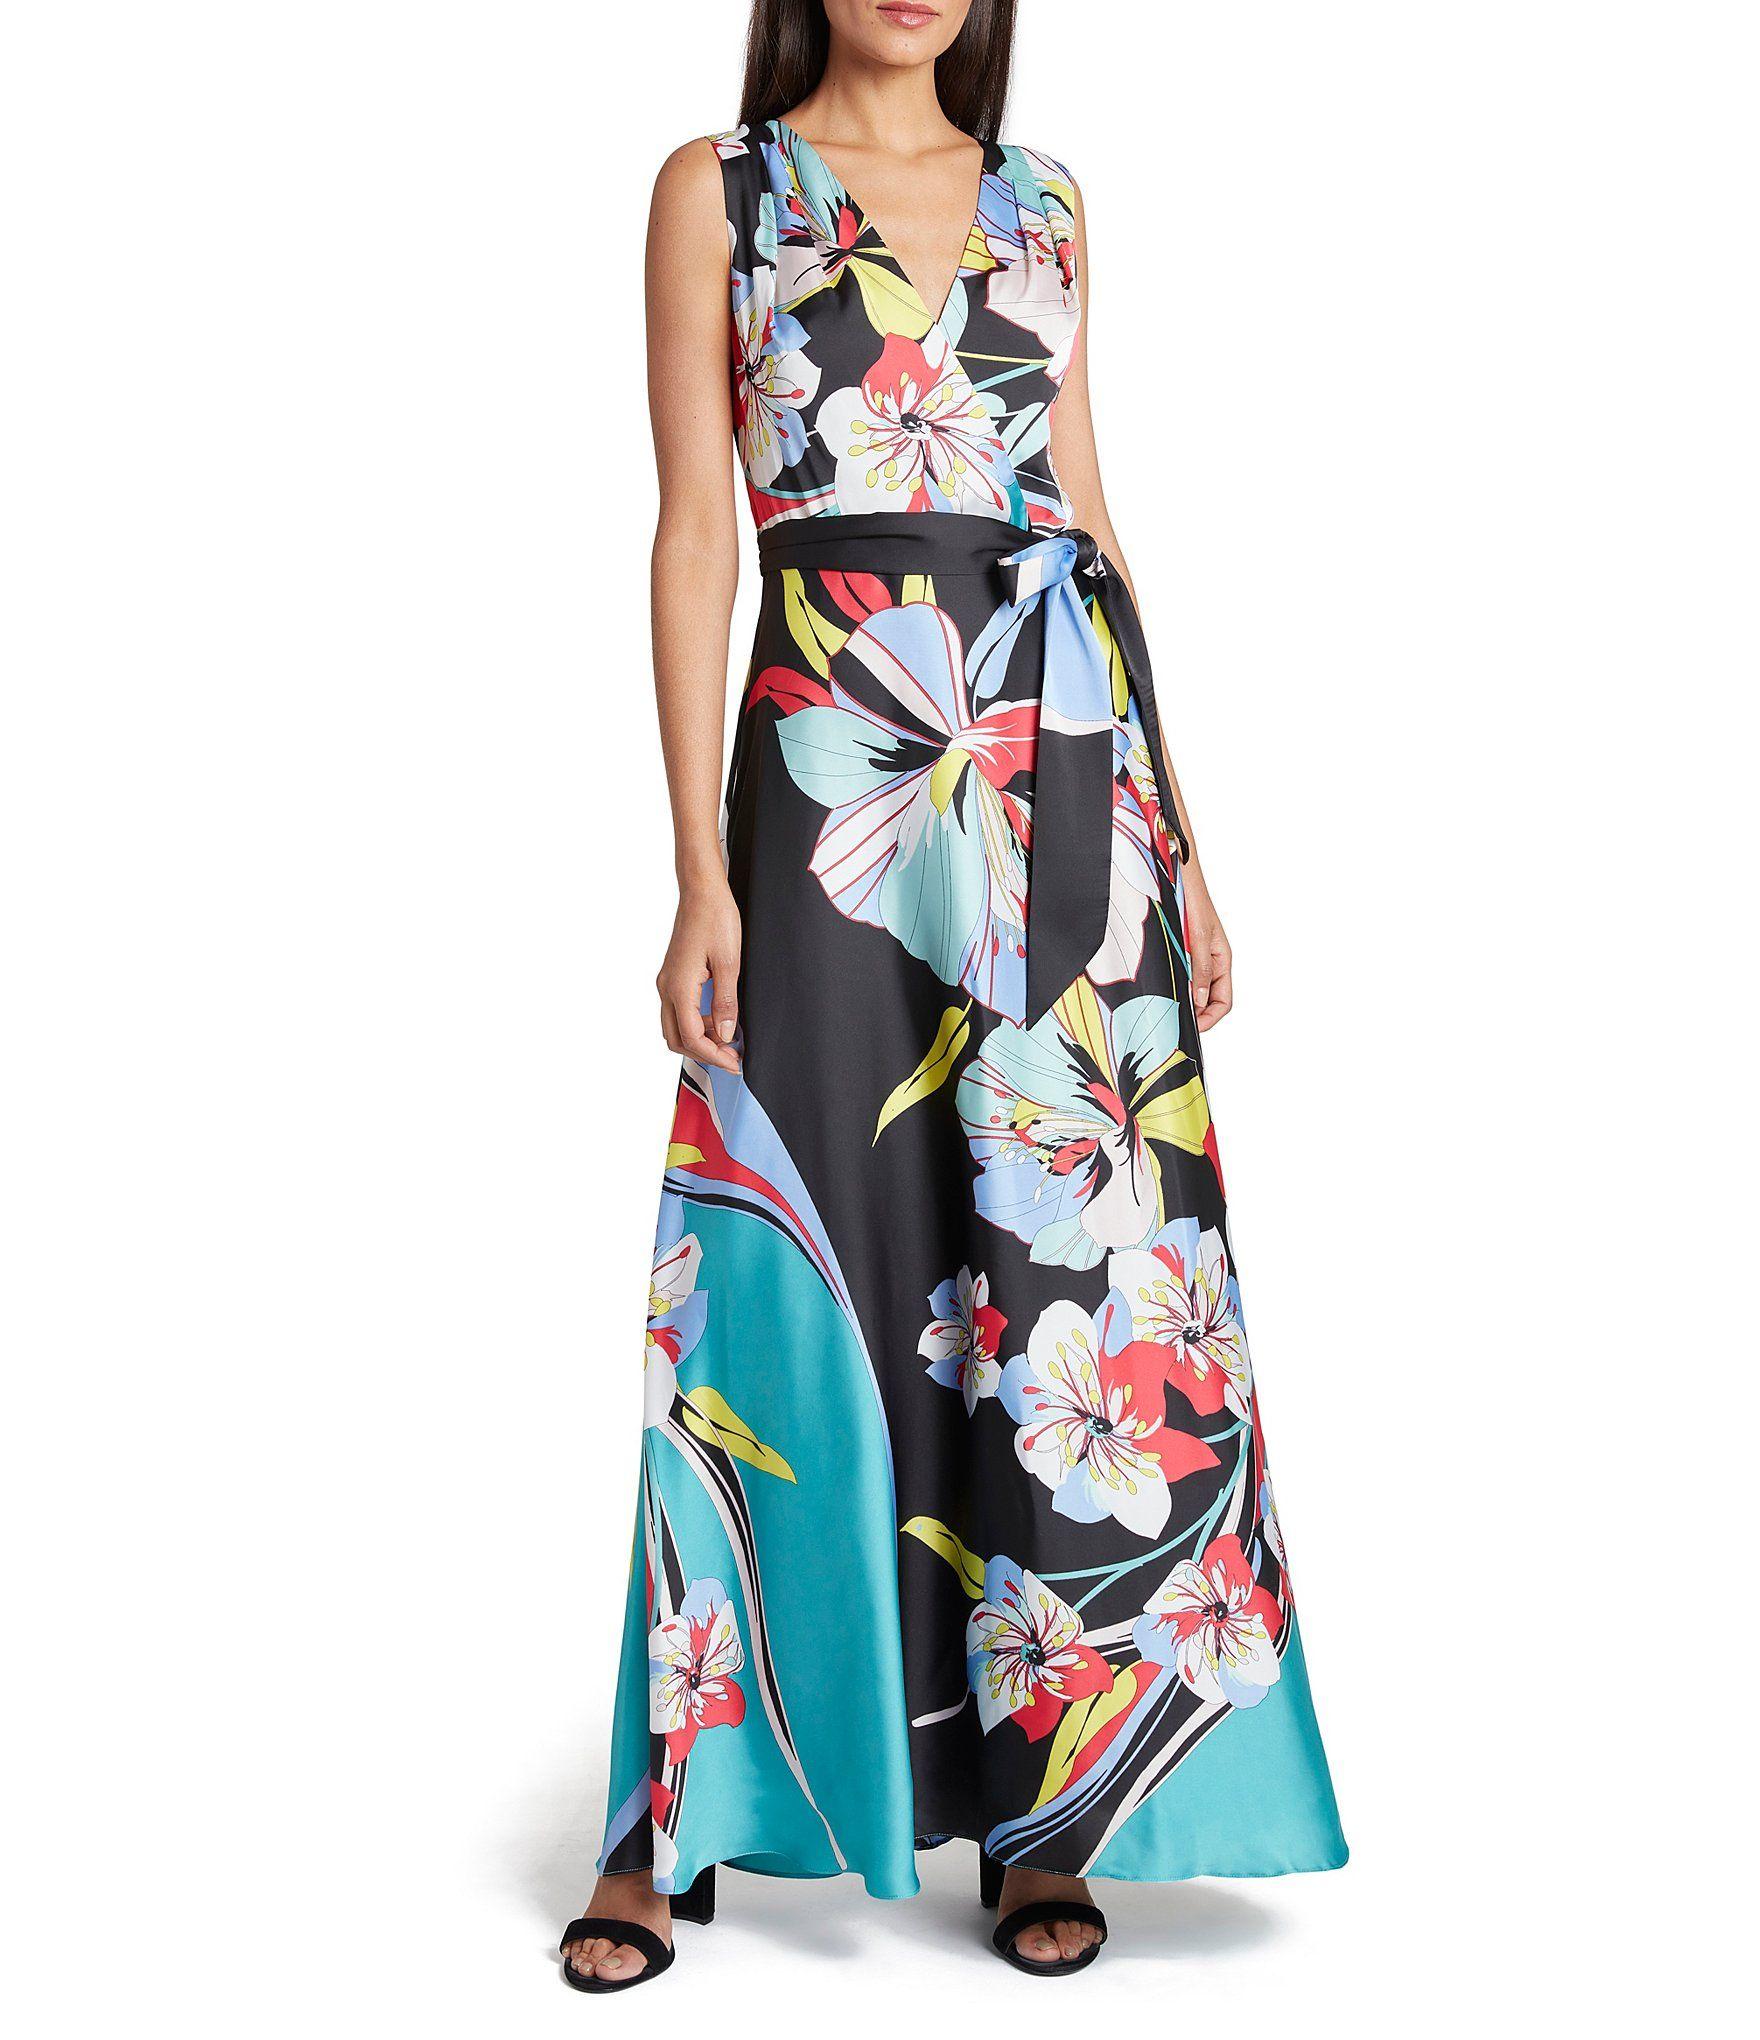 Shop For Tahari Asl Floral Print V Neck Tie Waist Charmeuse Maxi Dress At Dillard S Visit Dillard S To Find Cloth Maxi Dress Floral Maxi Dress Maxi Dress Blue [ 2040 x 1760 Pixel ]